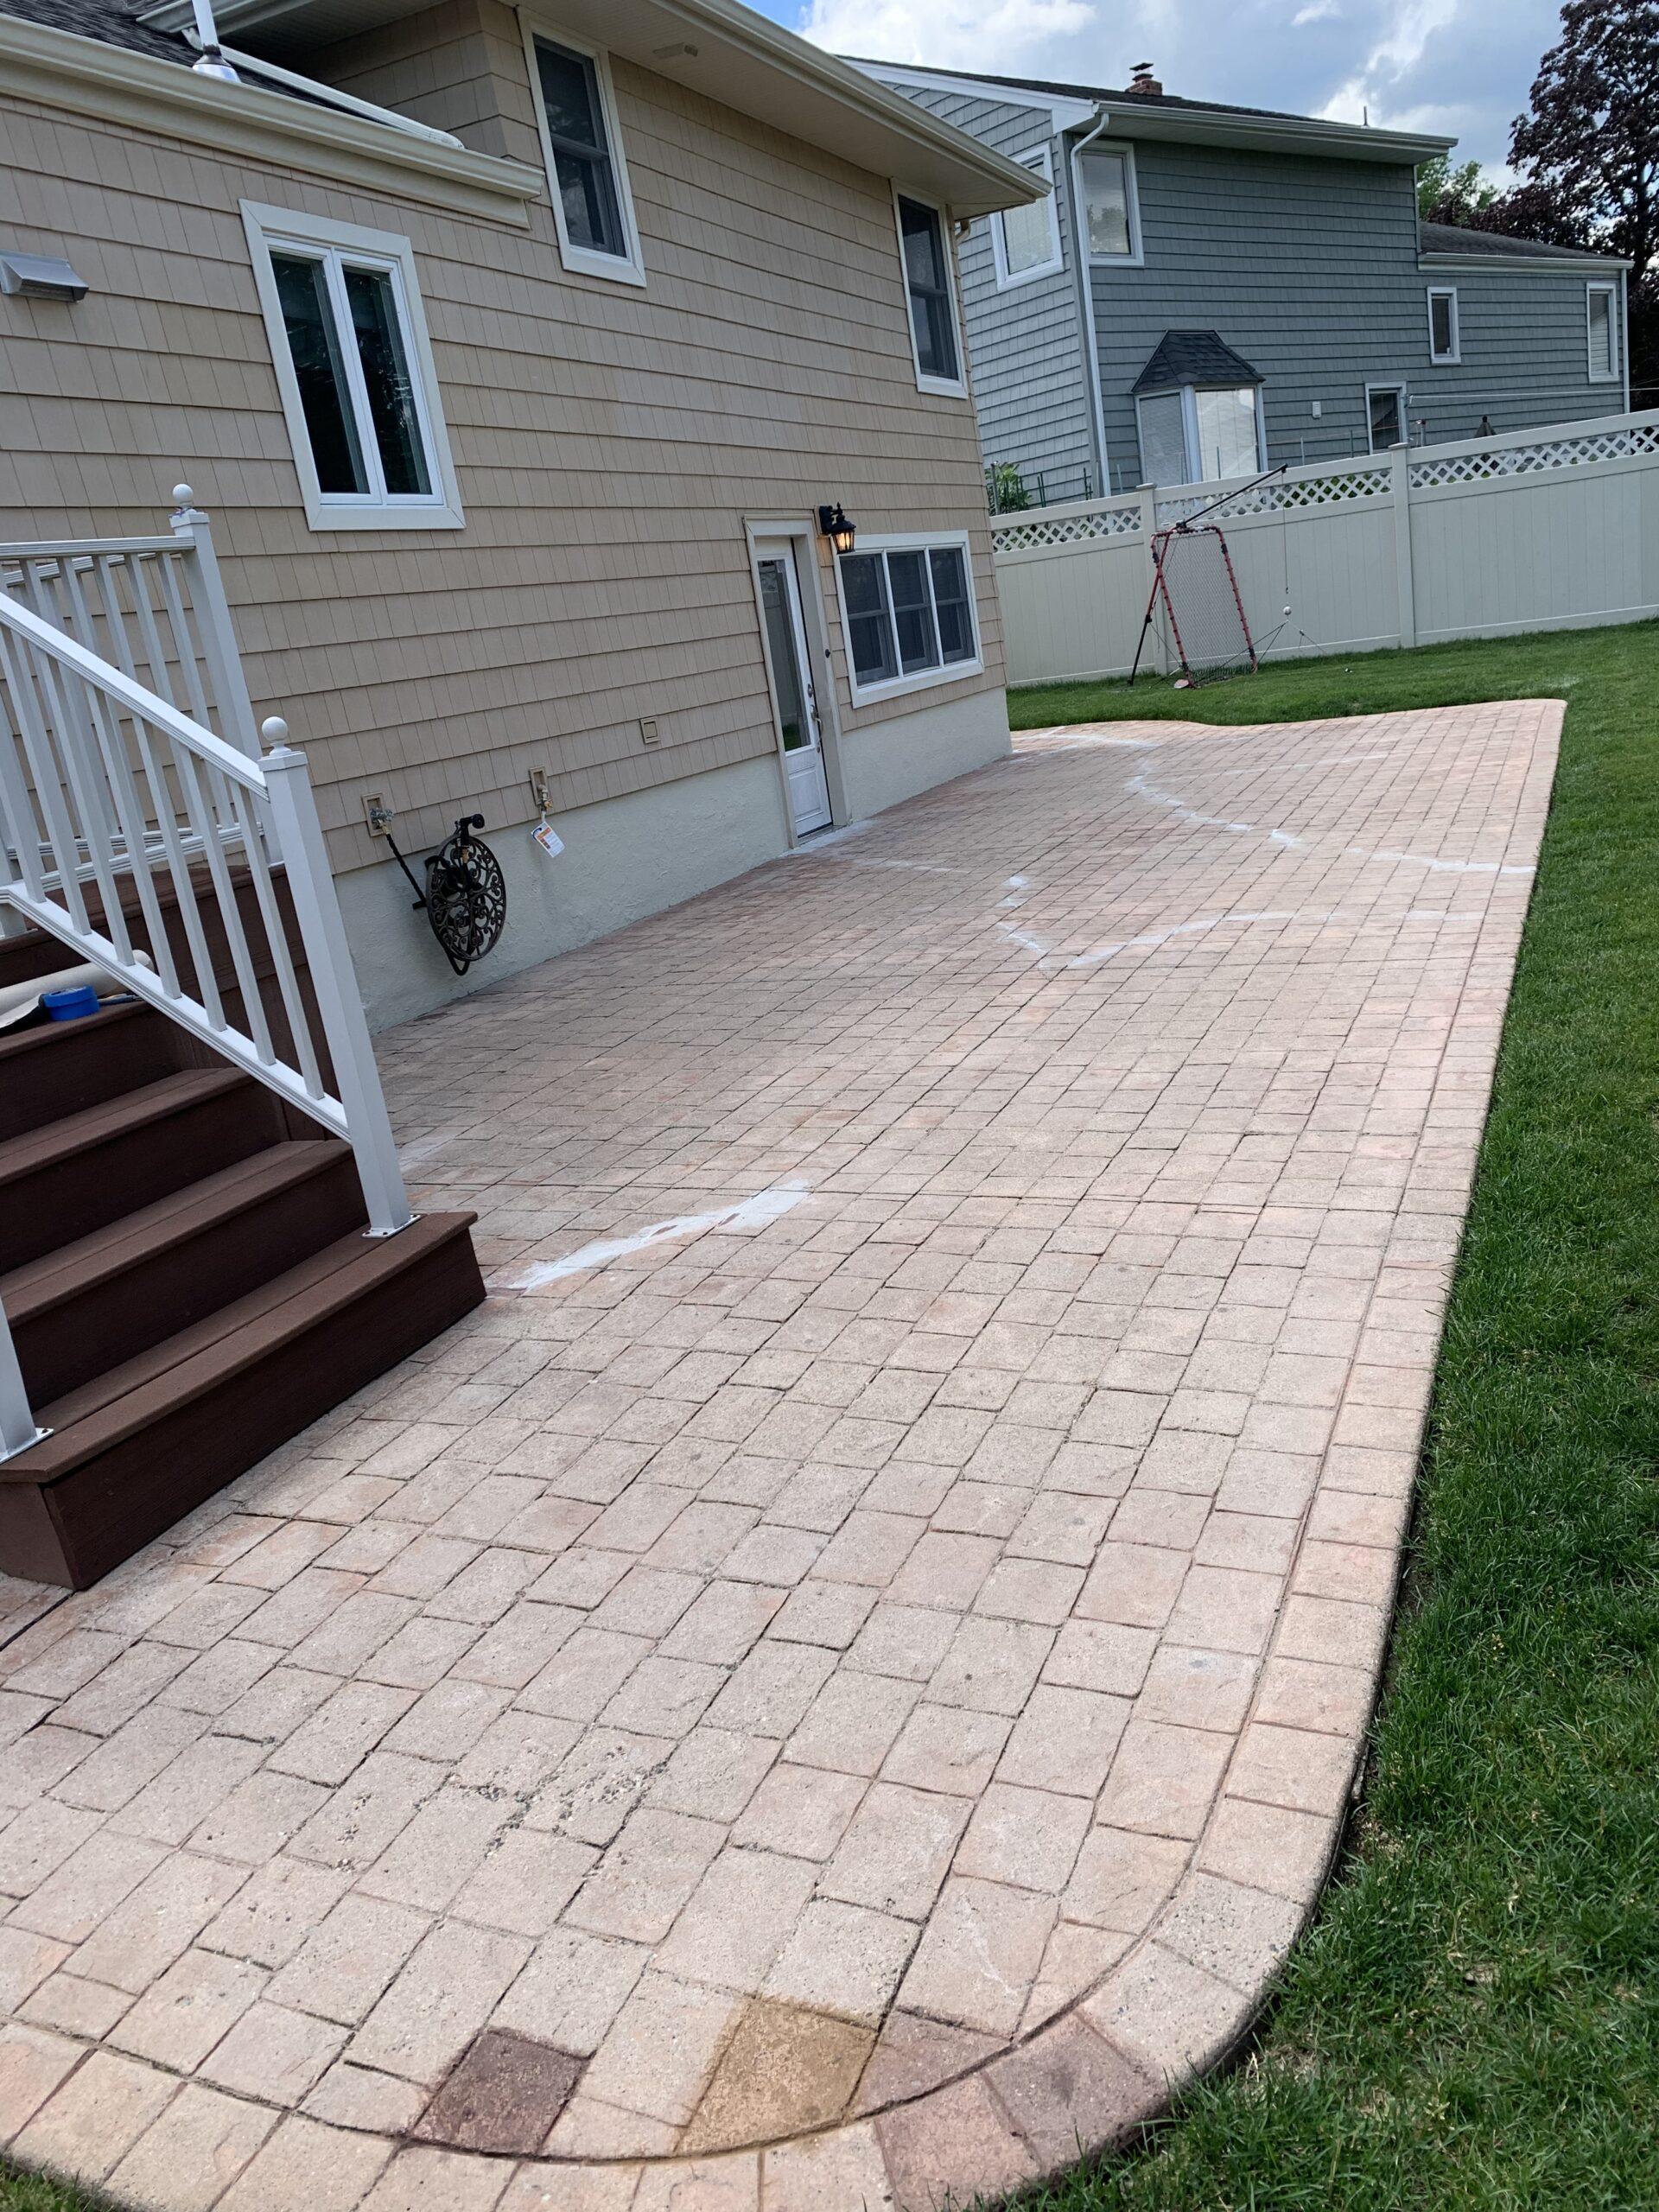 Neglected Concrete Patio